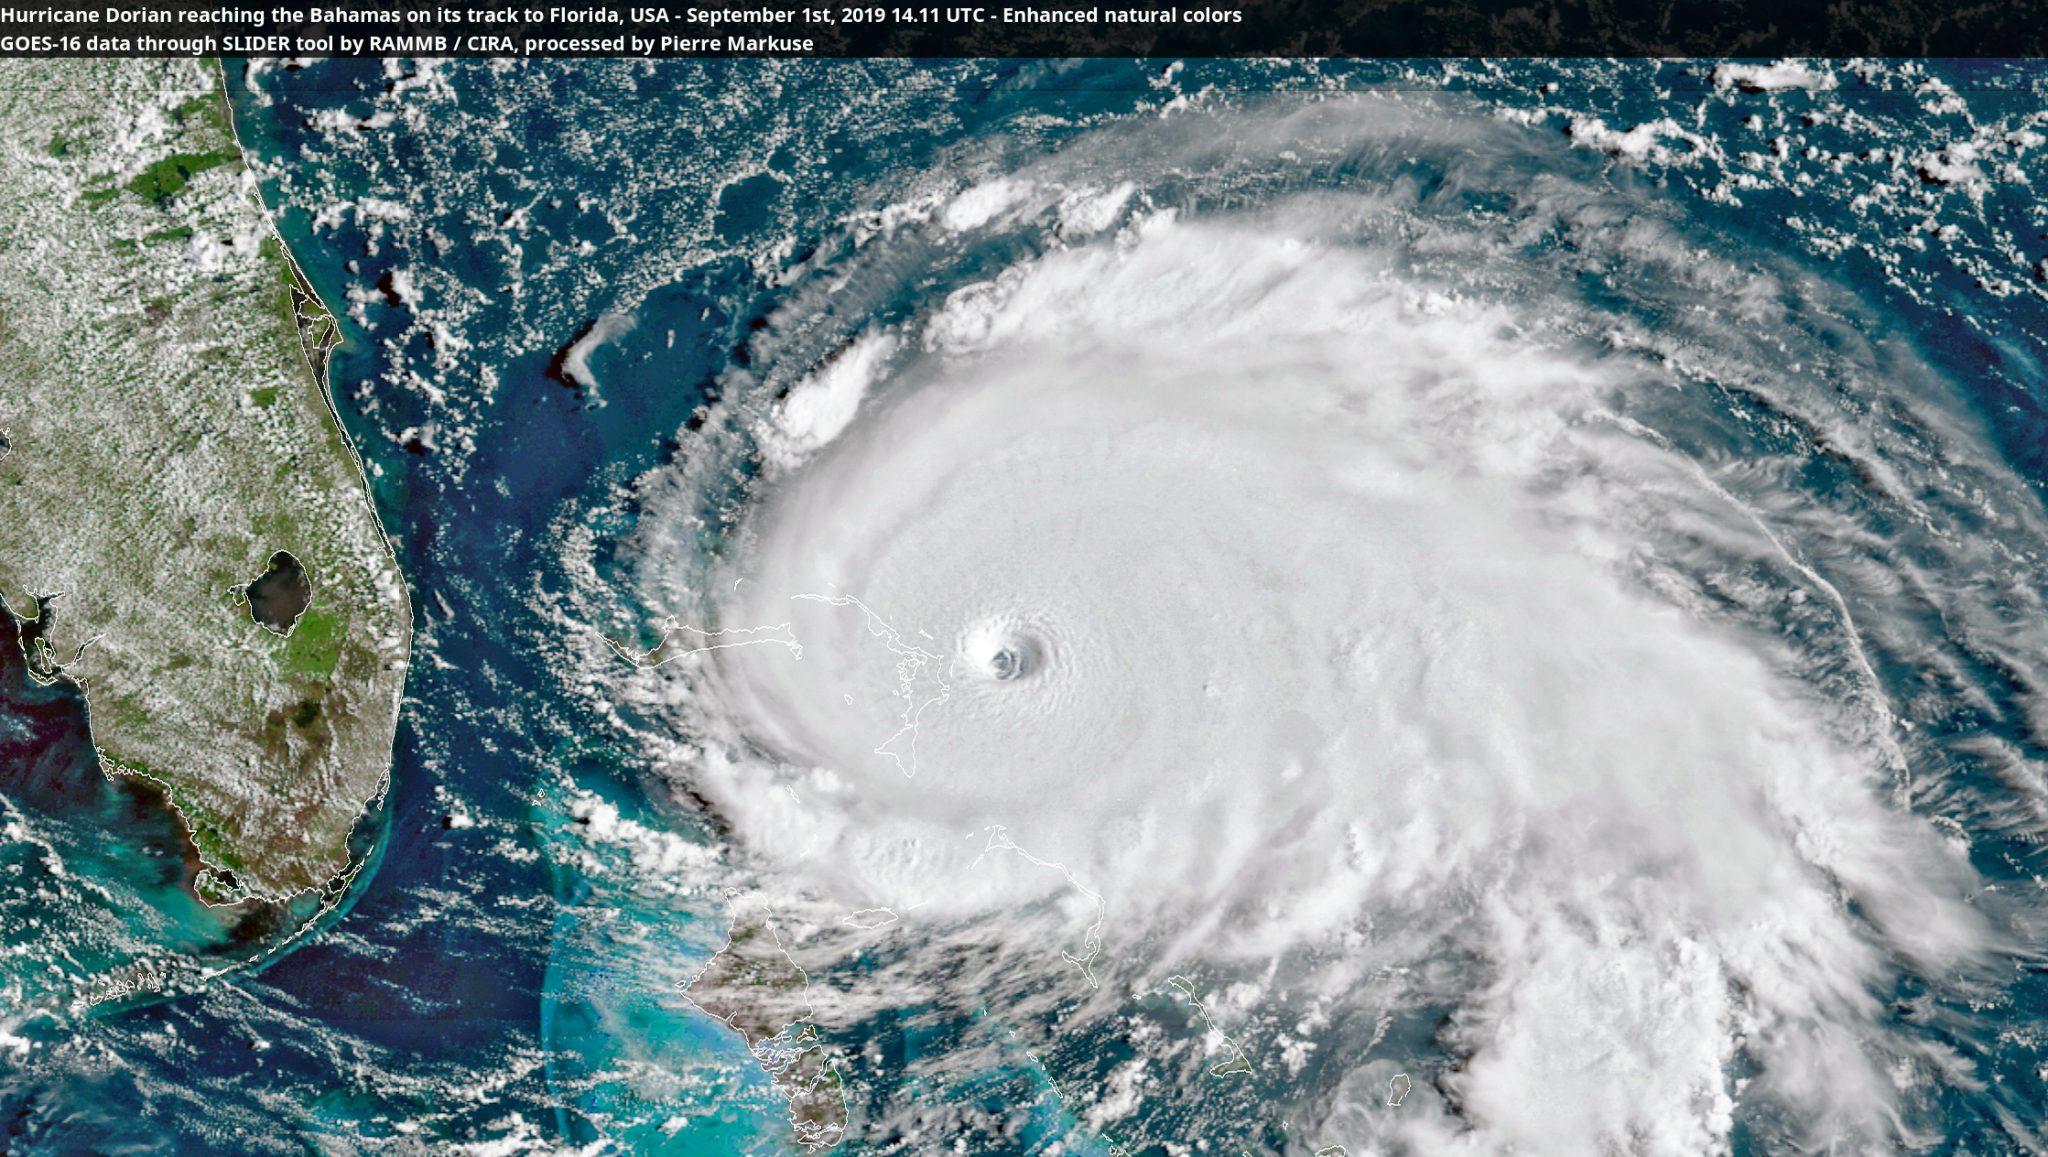 desc:Hurricane Dorian reaching the Bahamas on its track to Florida, USA - September 1st, 2019 14.11 UTC